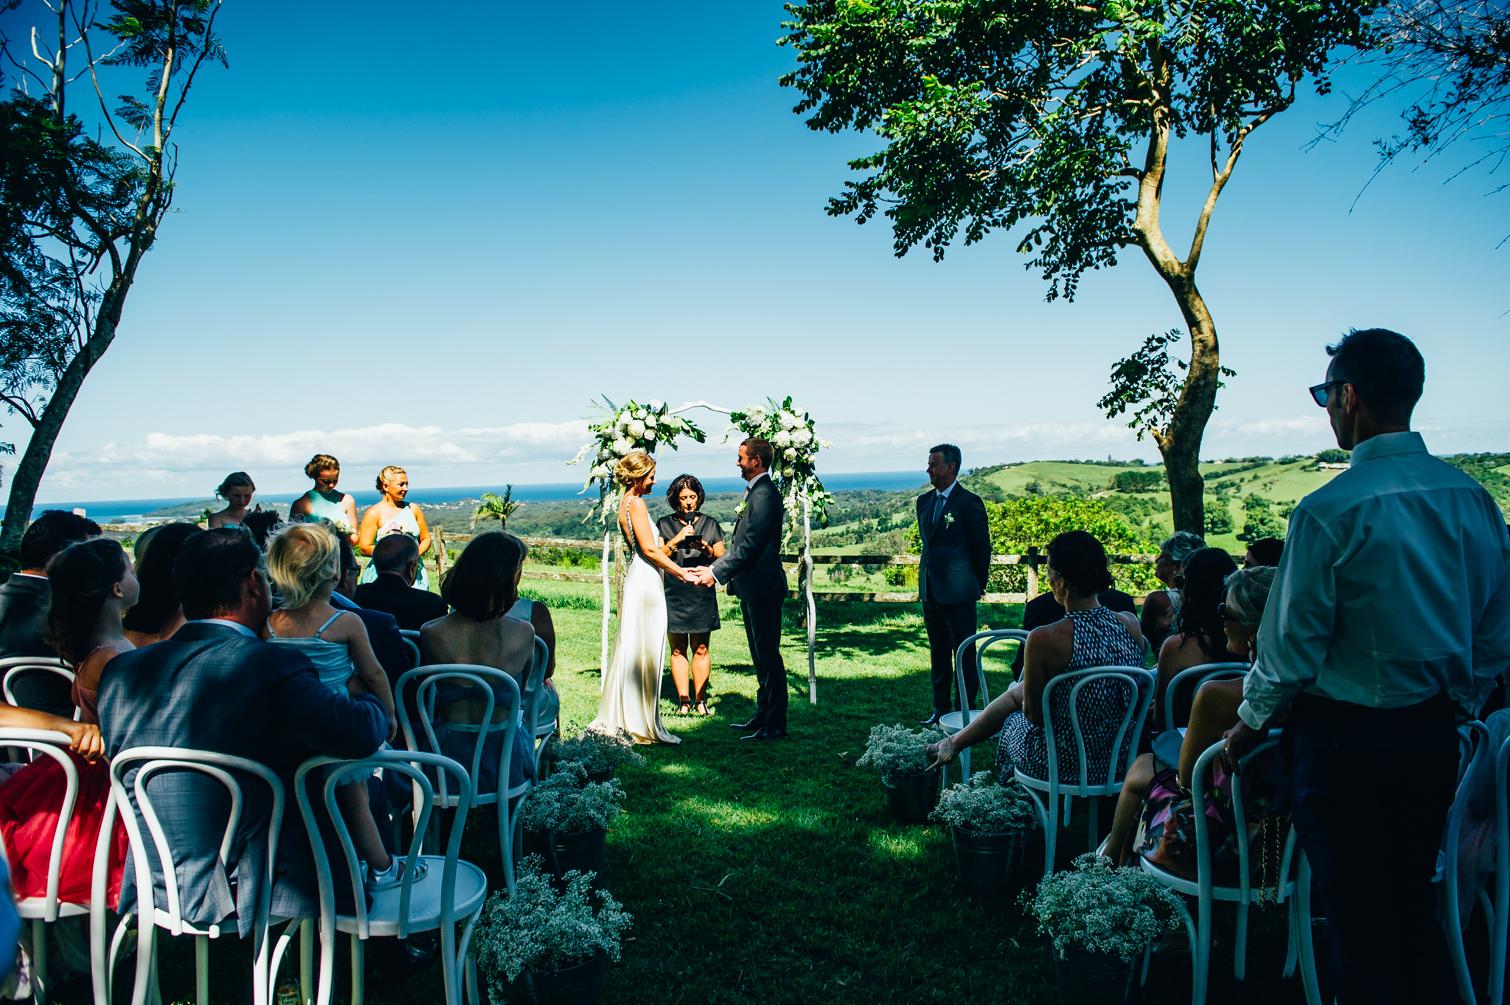 Byron_View_Wedding_Venue-12.jpg